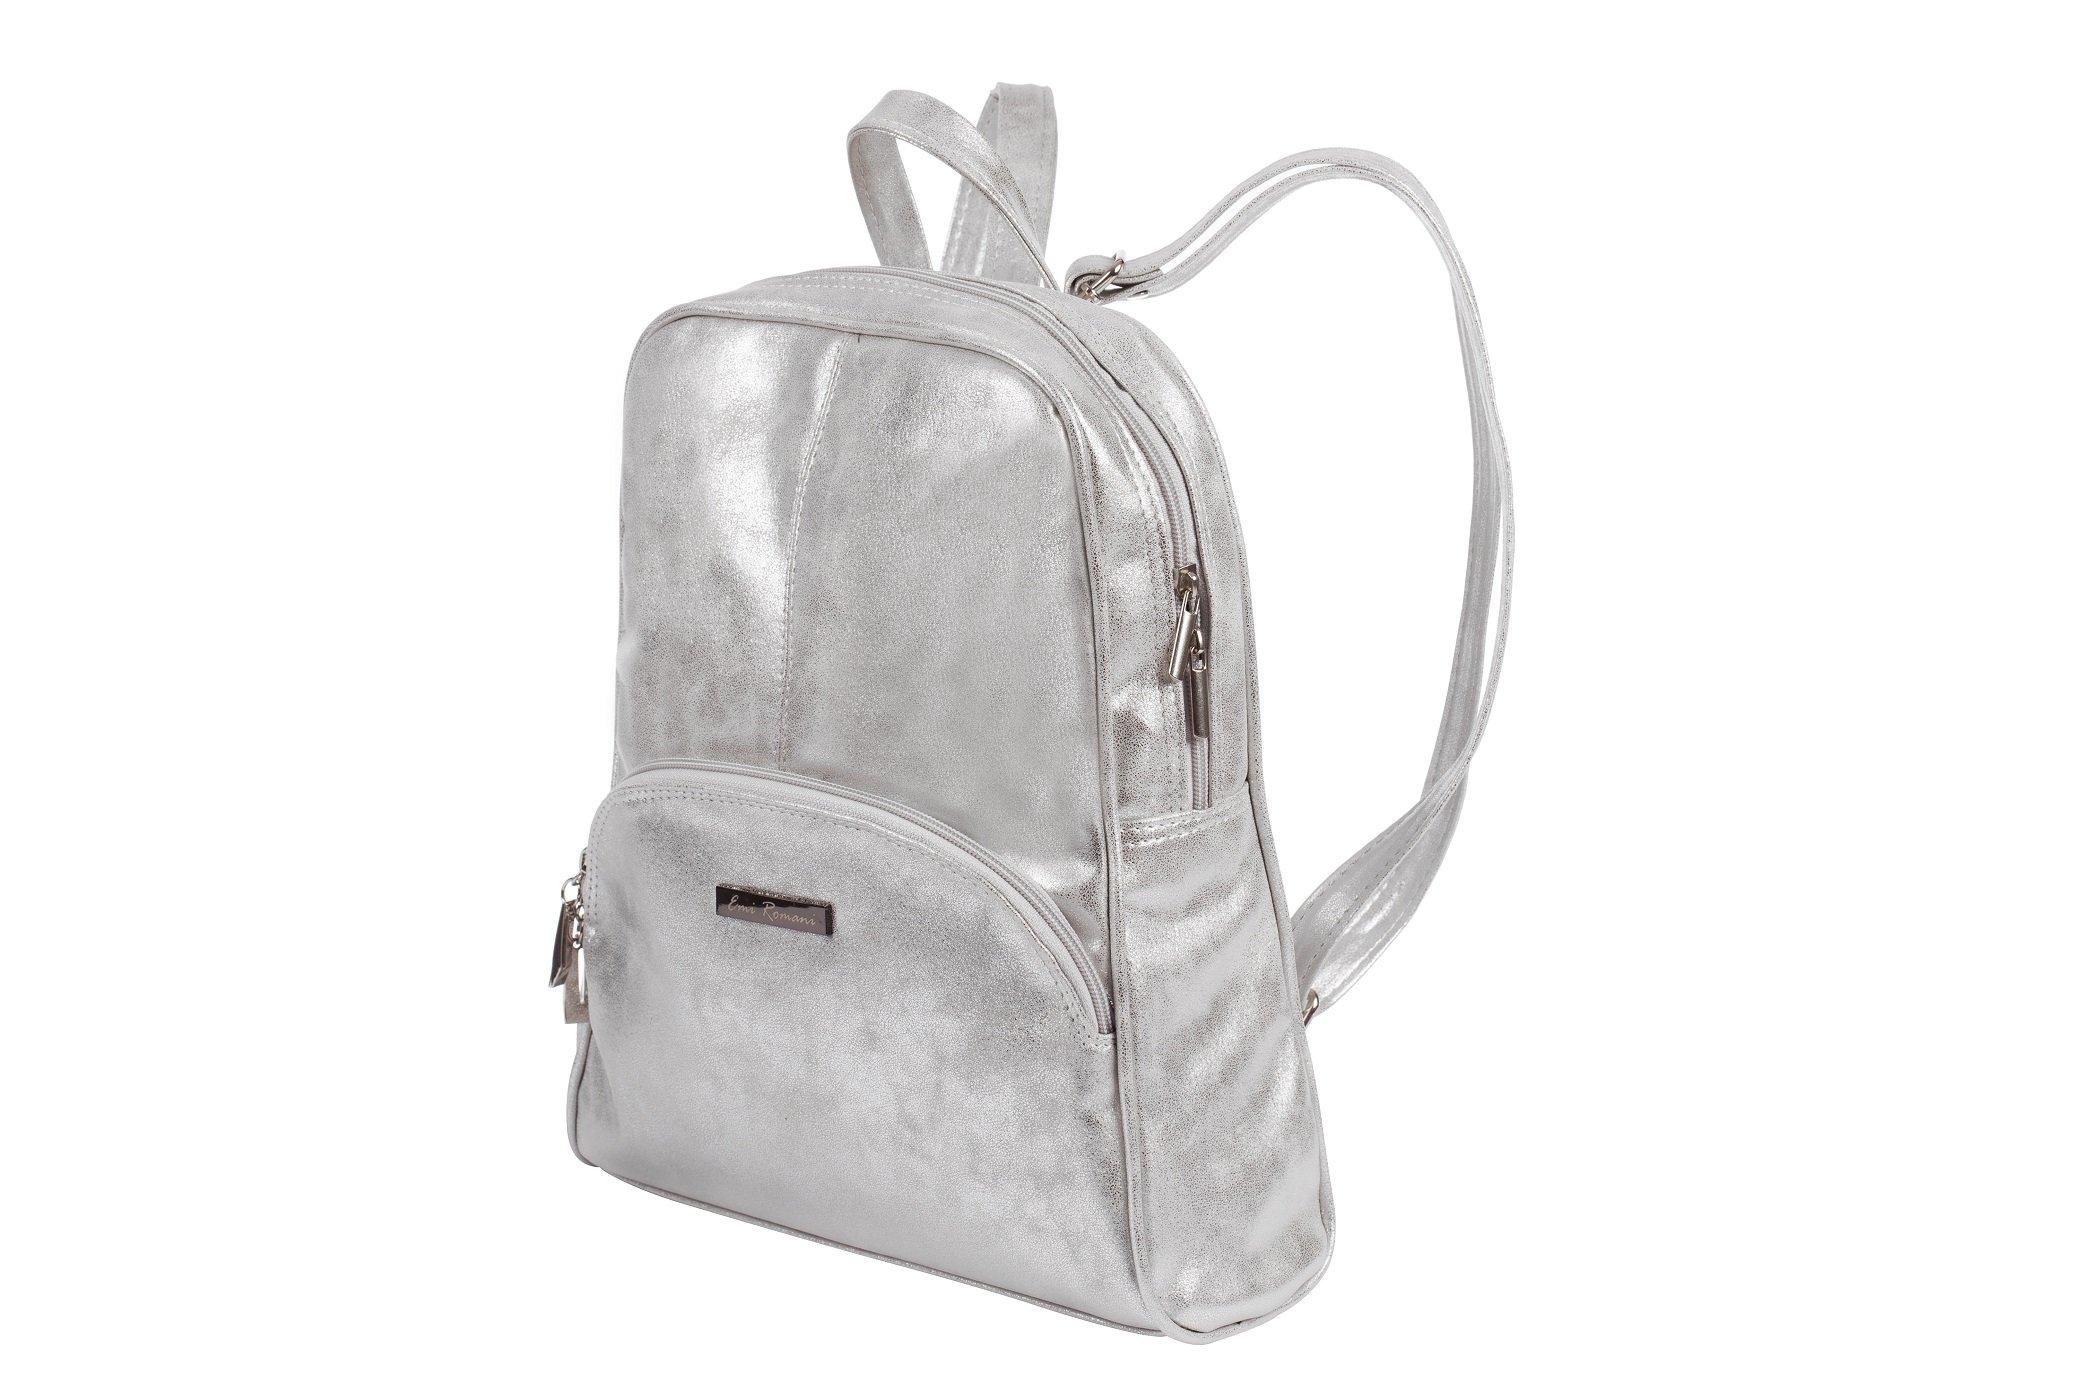 0e5dcec4d9e41 Torebka plecak - kolor srebrny, cena, opinie - sklep MB Classic Bag